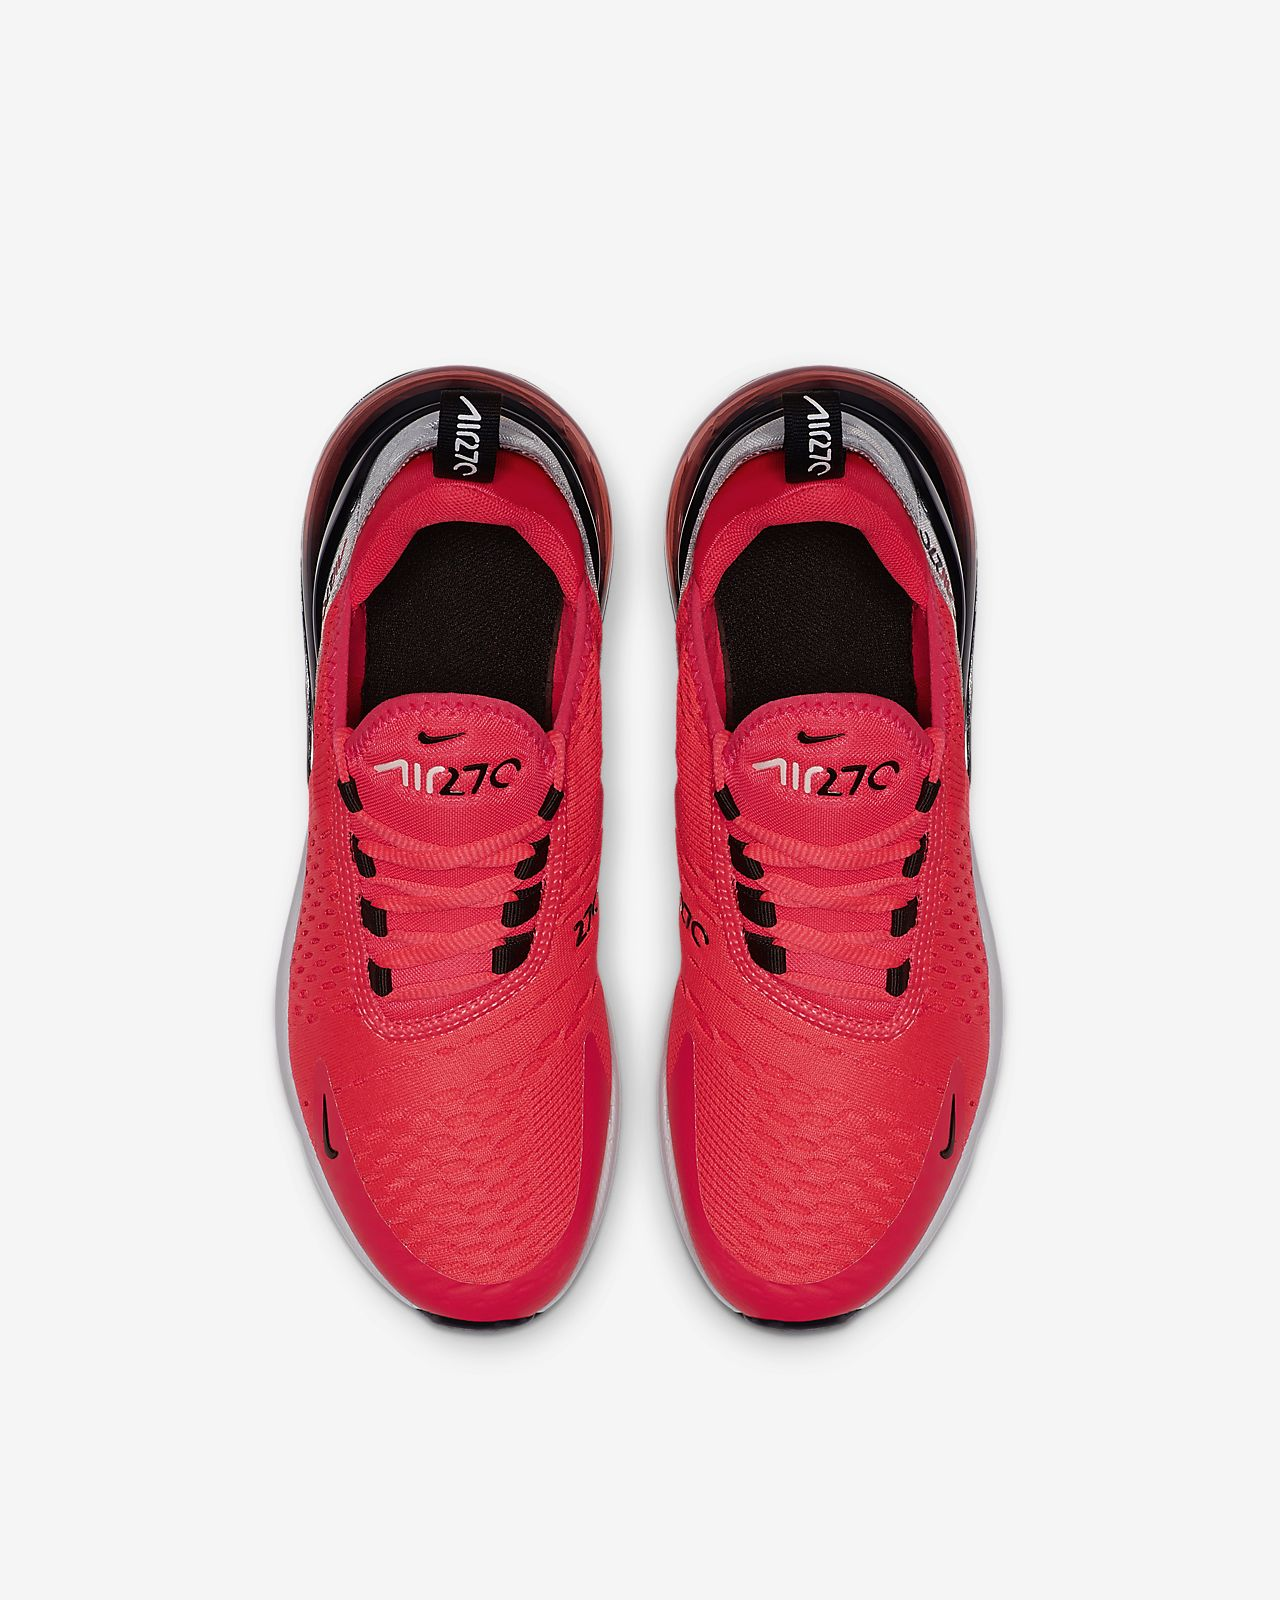 637bb990c22 Nike Air Max 270 Older Kids  Shoe. Nike.com GB